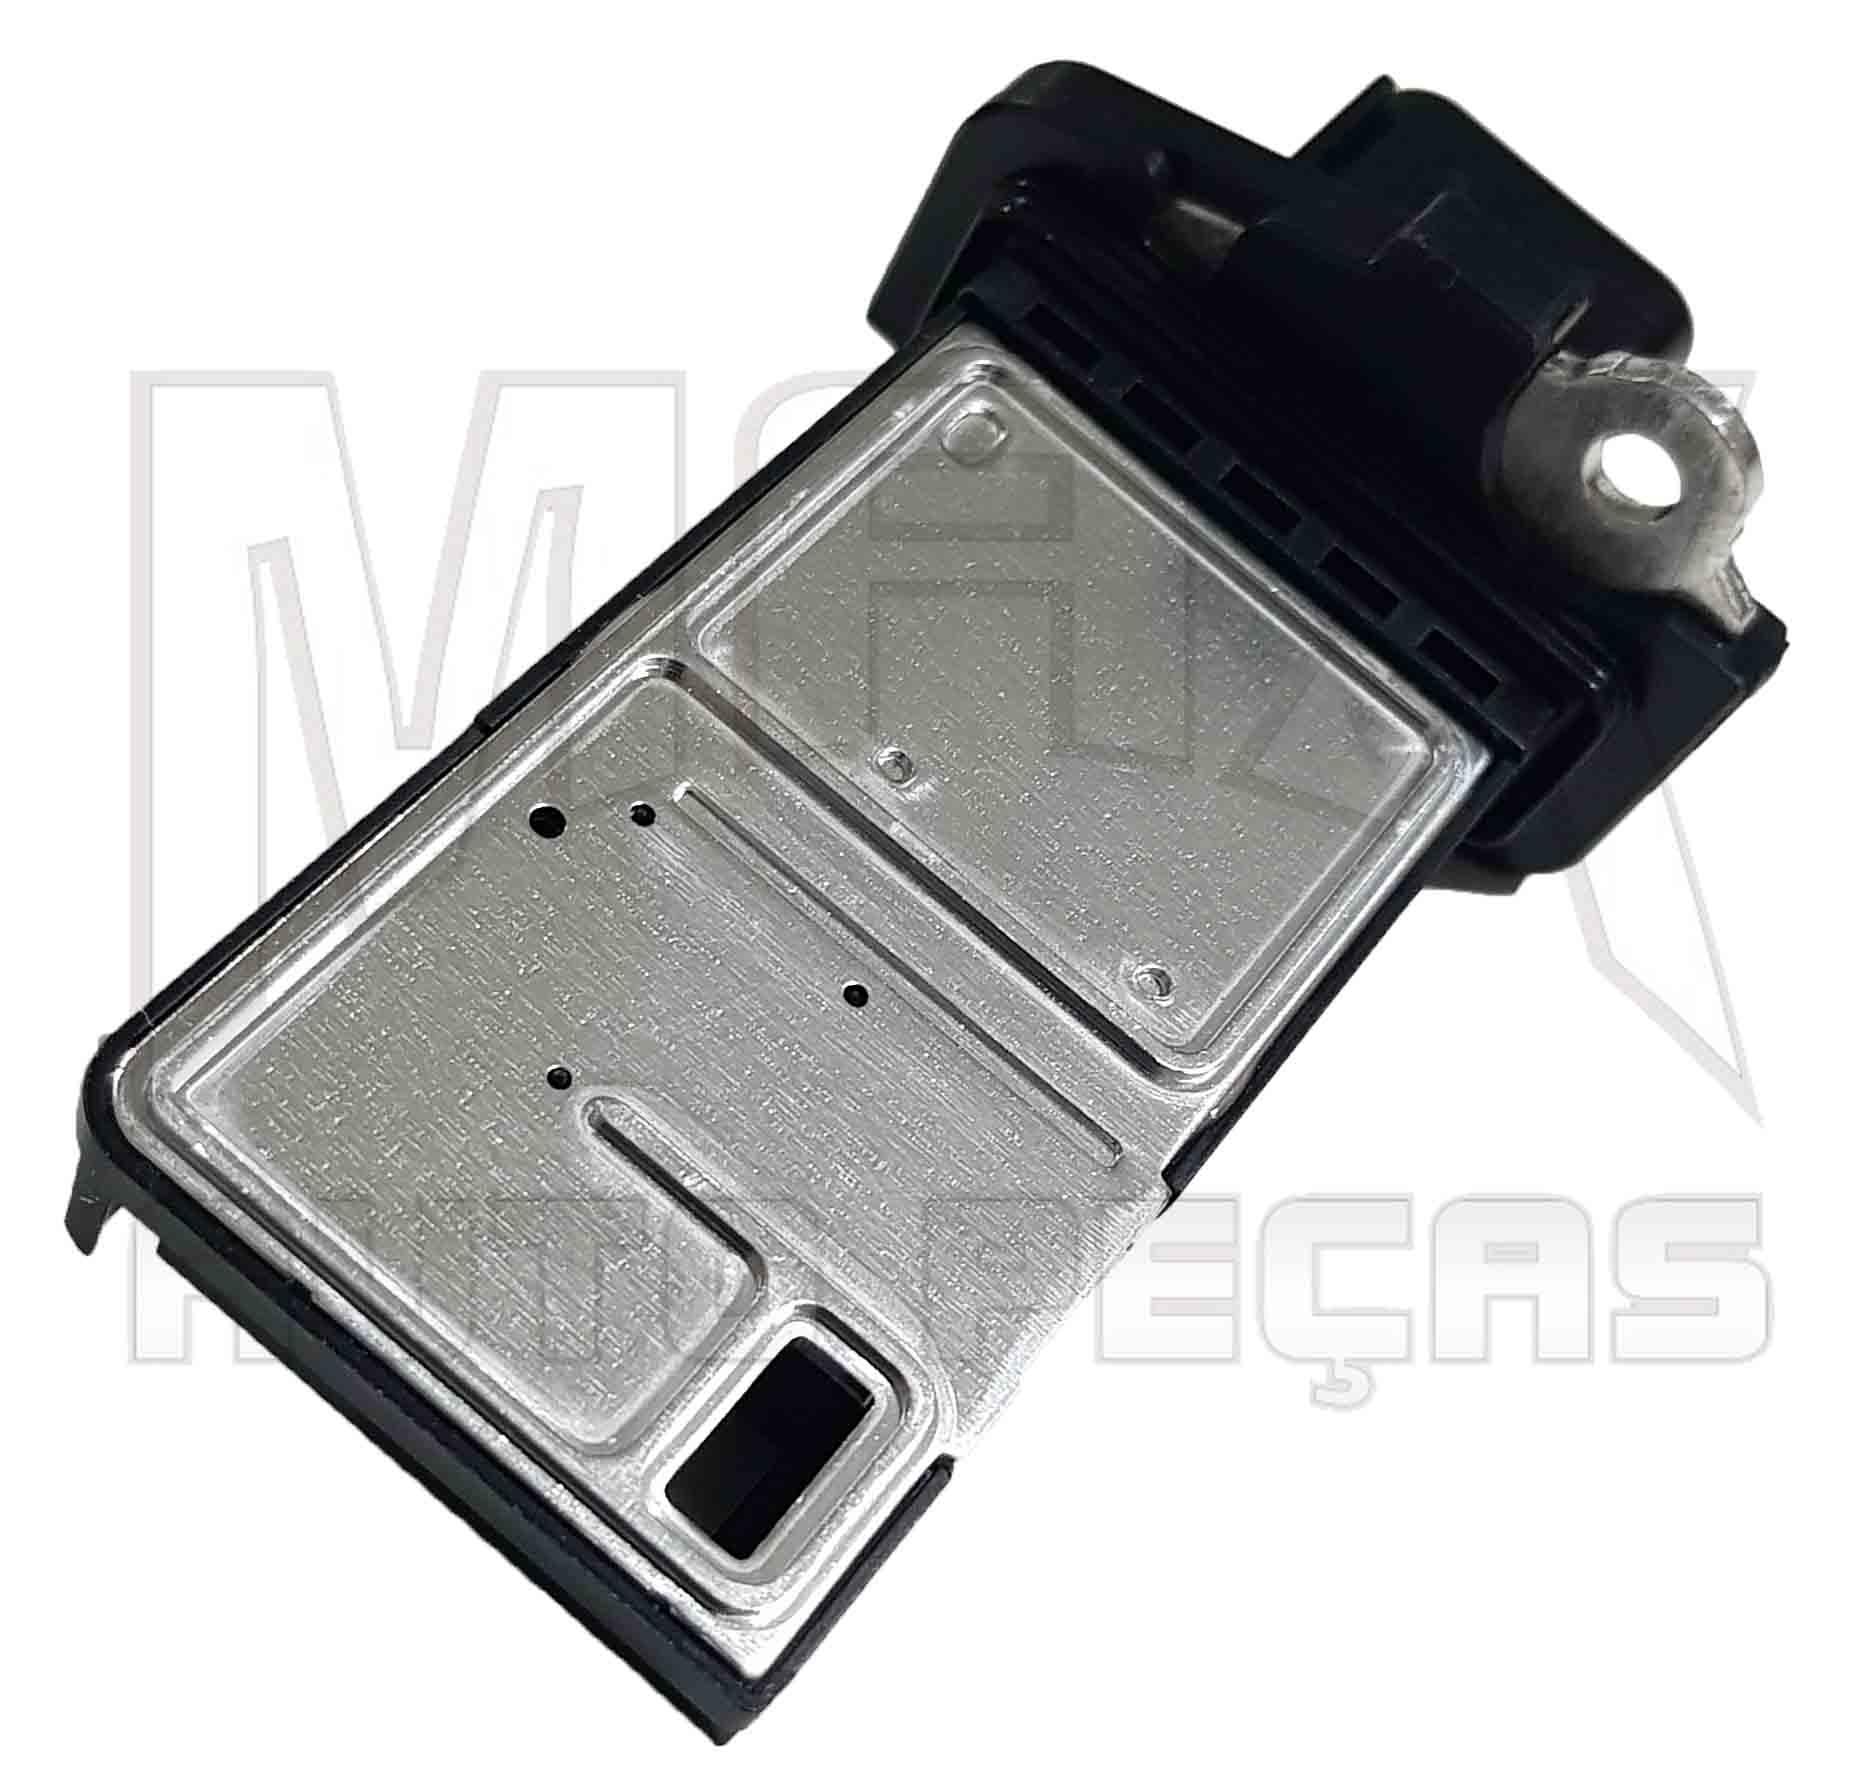 Sensor de Vazão de Massa de Ar (MAF) - Transit - 6C1112B579AA - ORIGINAL